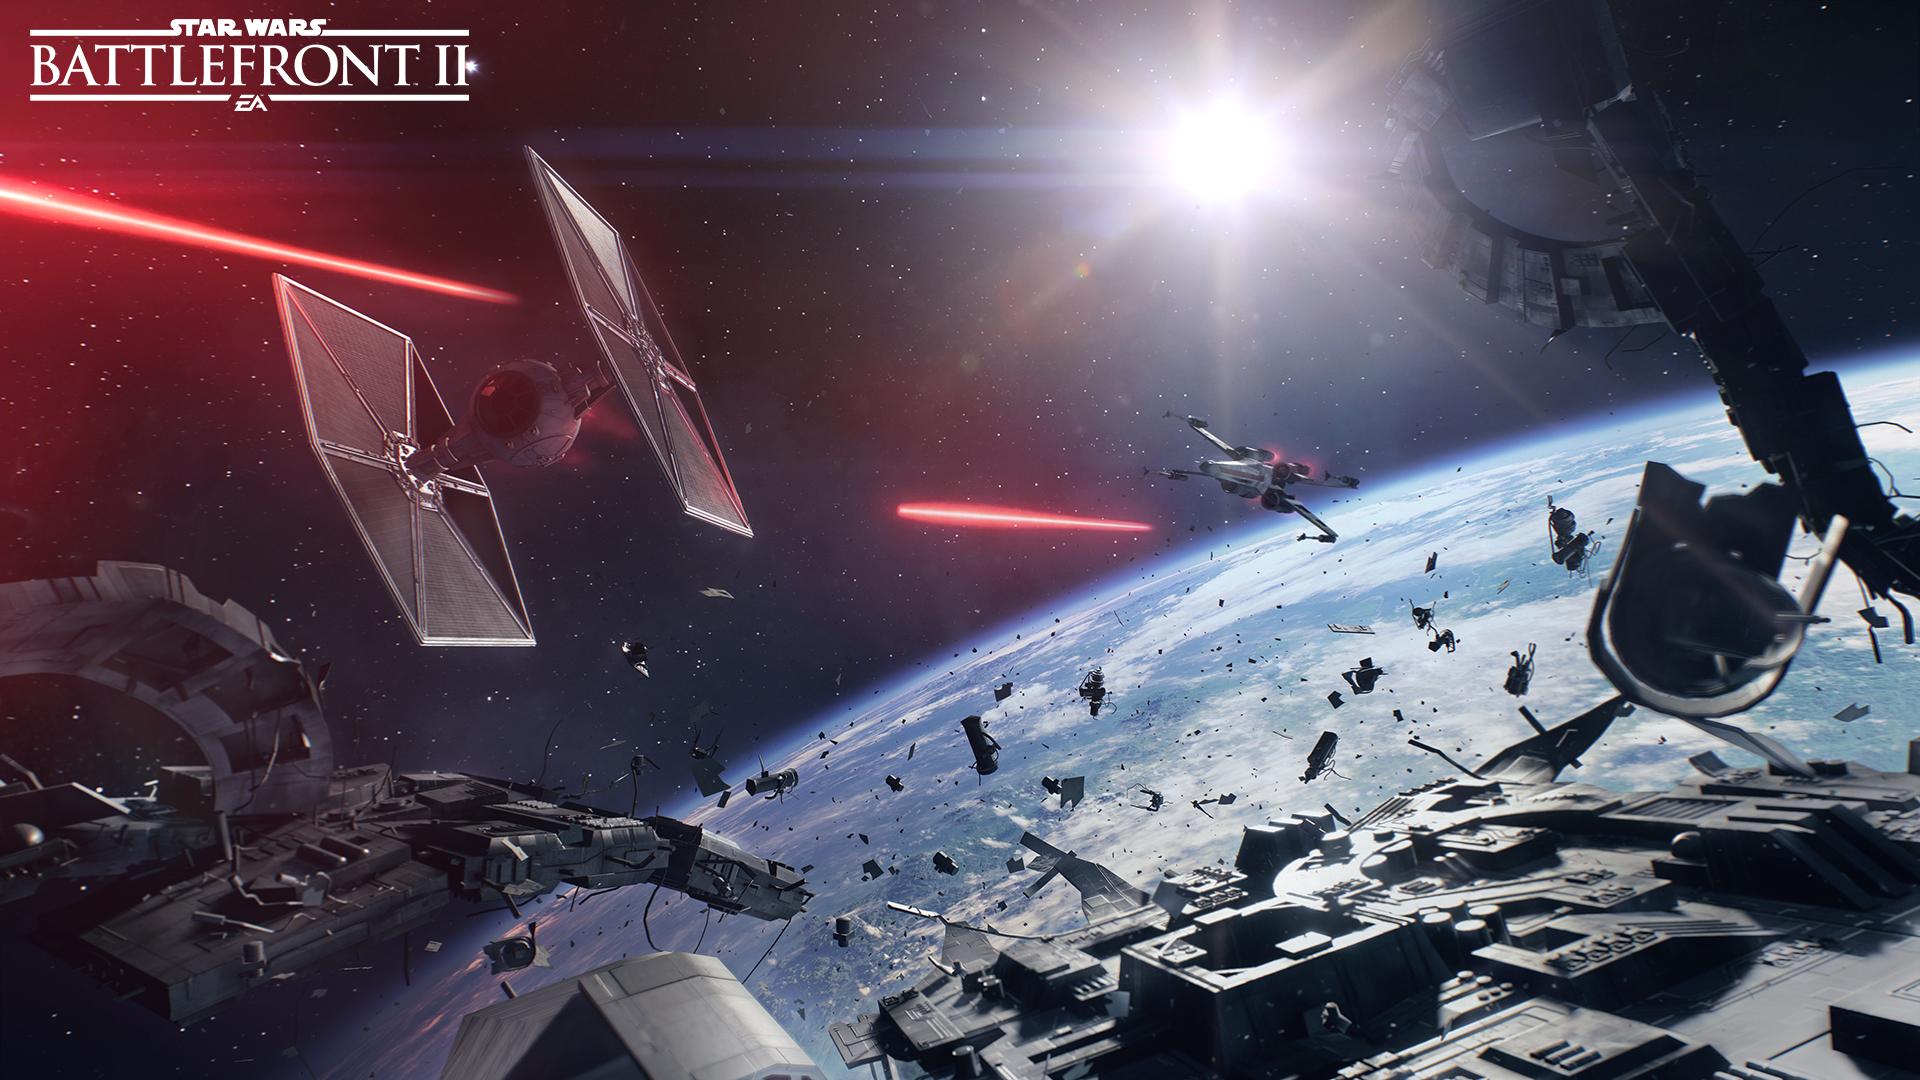 Imágenes De Star Wars Battlefront Ii Meristation